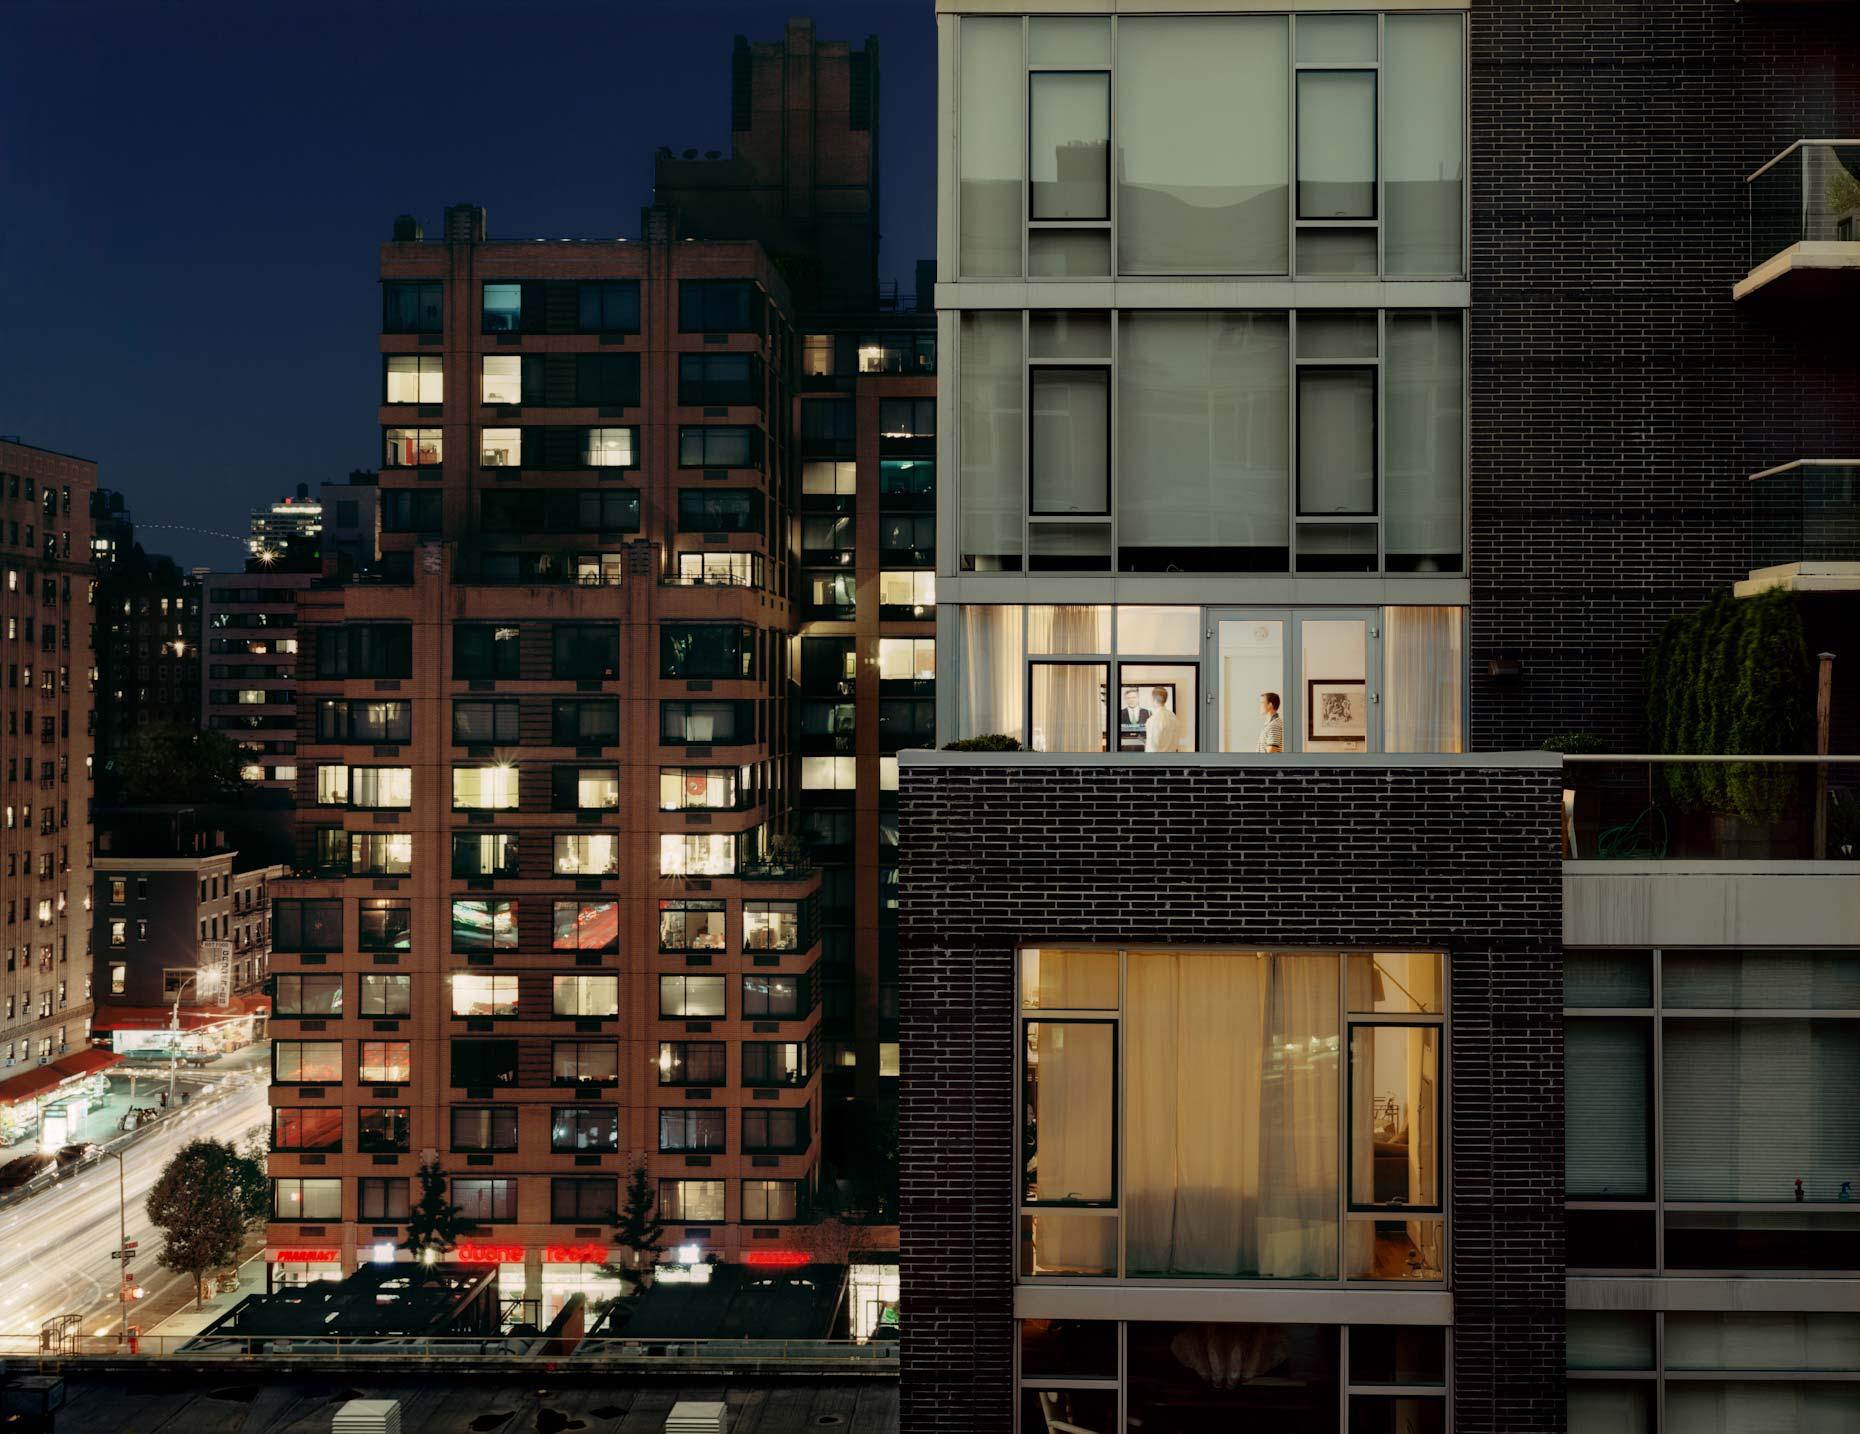 out-my-window-by-gail-albert-halaban-gessato-5